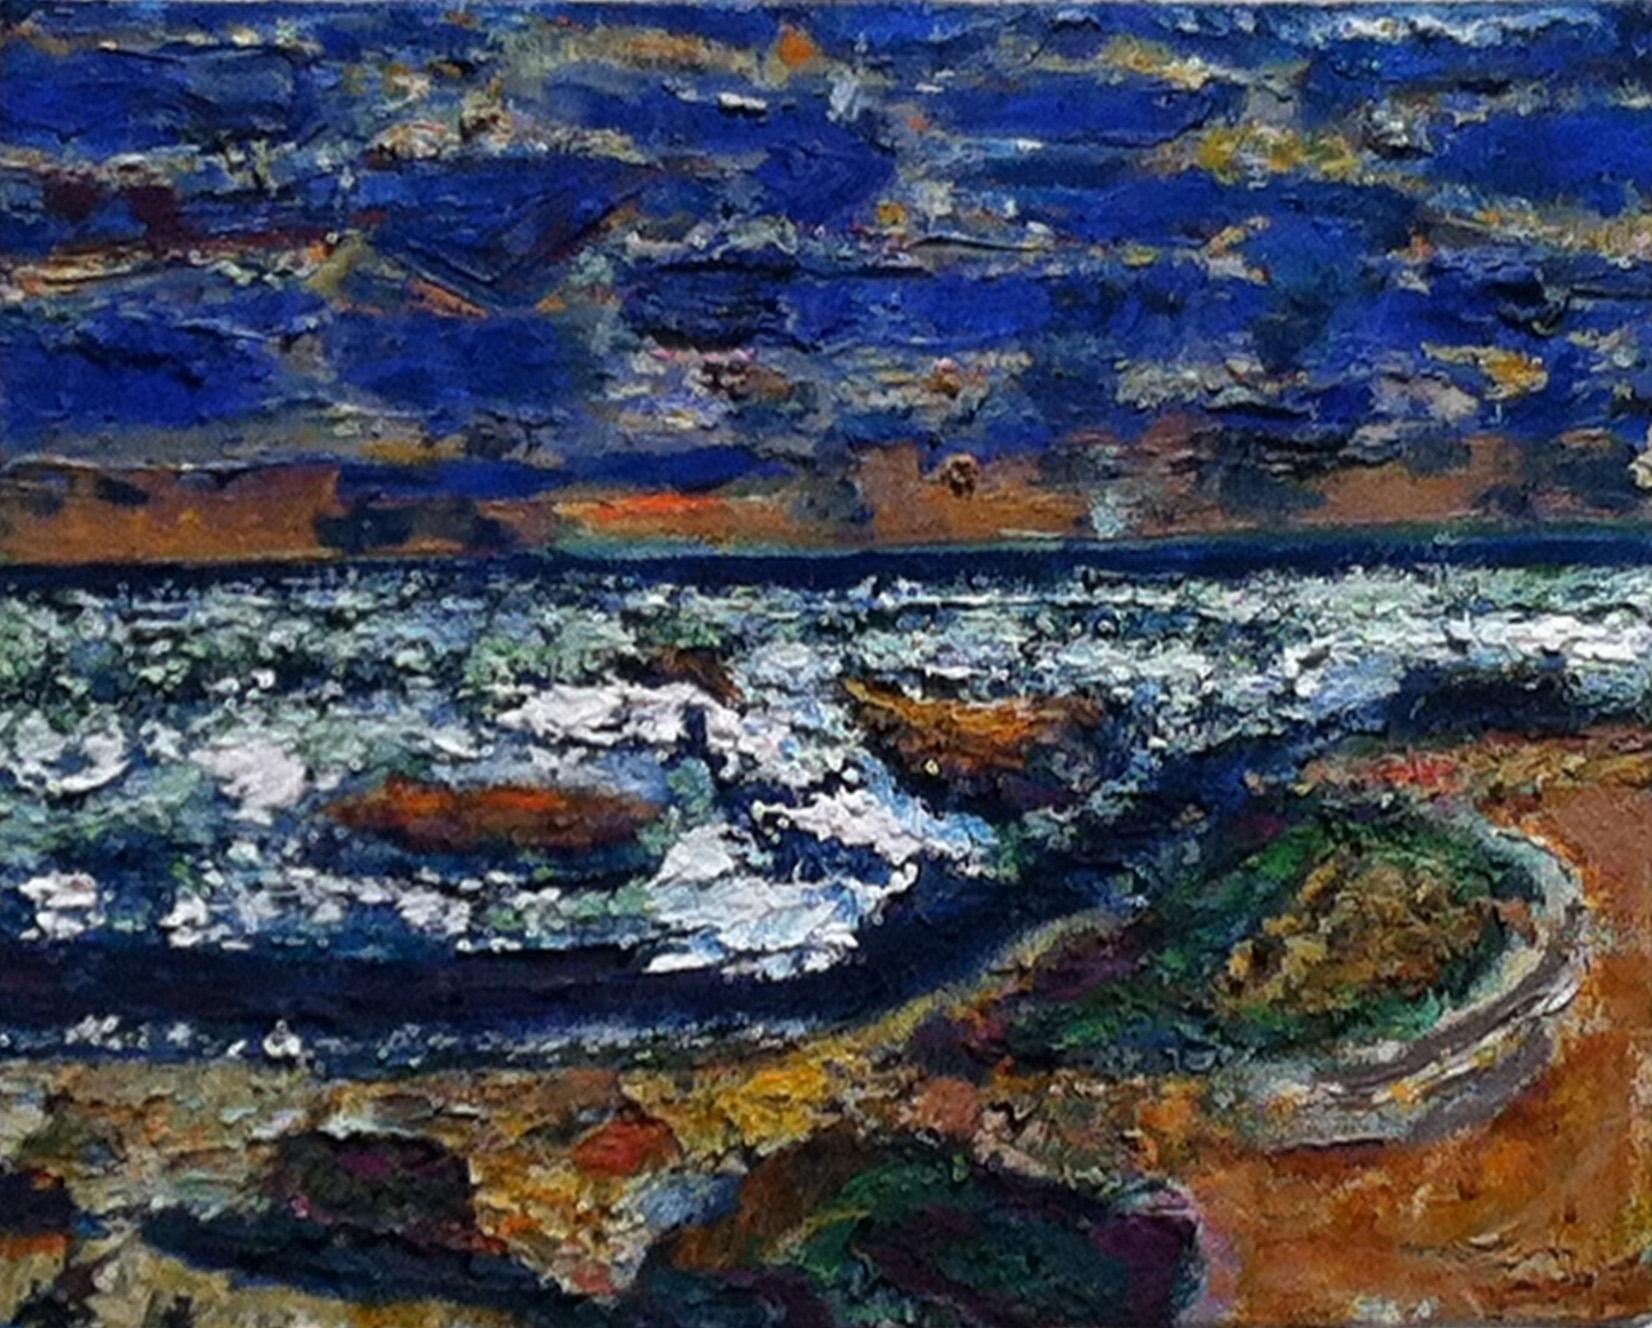 Ocean Light, 2004 - 05 oil on canvas, 8 x 10 inches